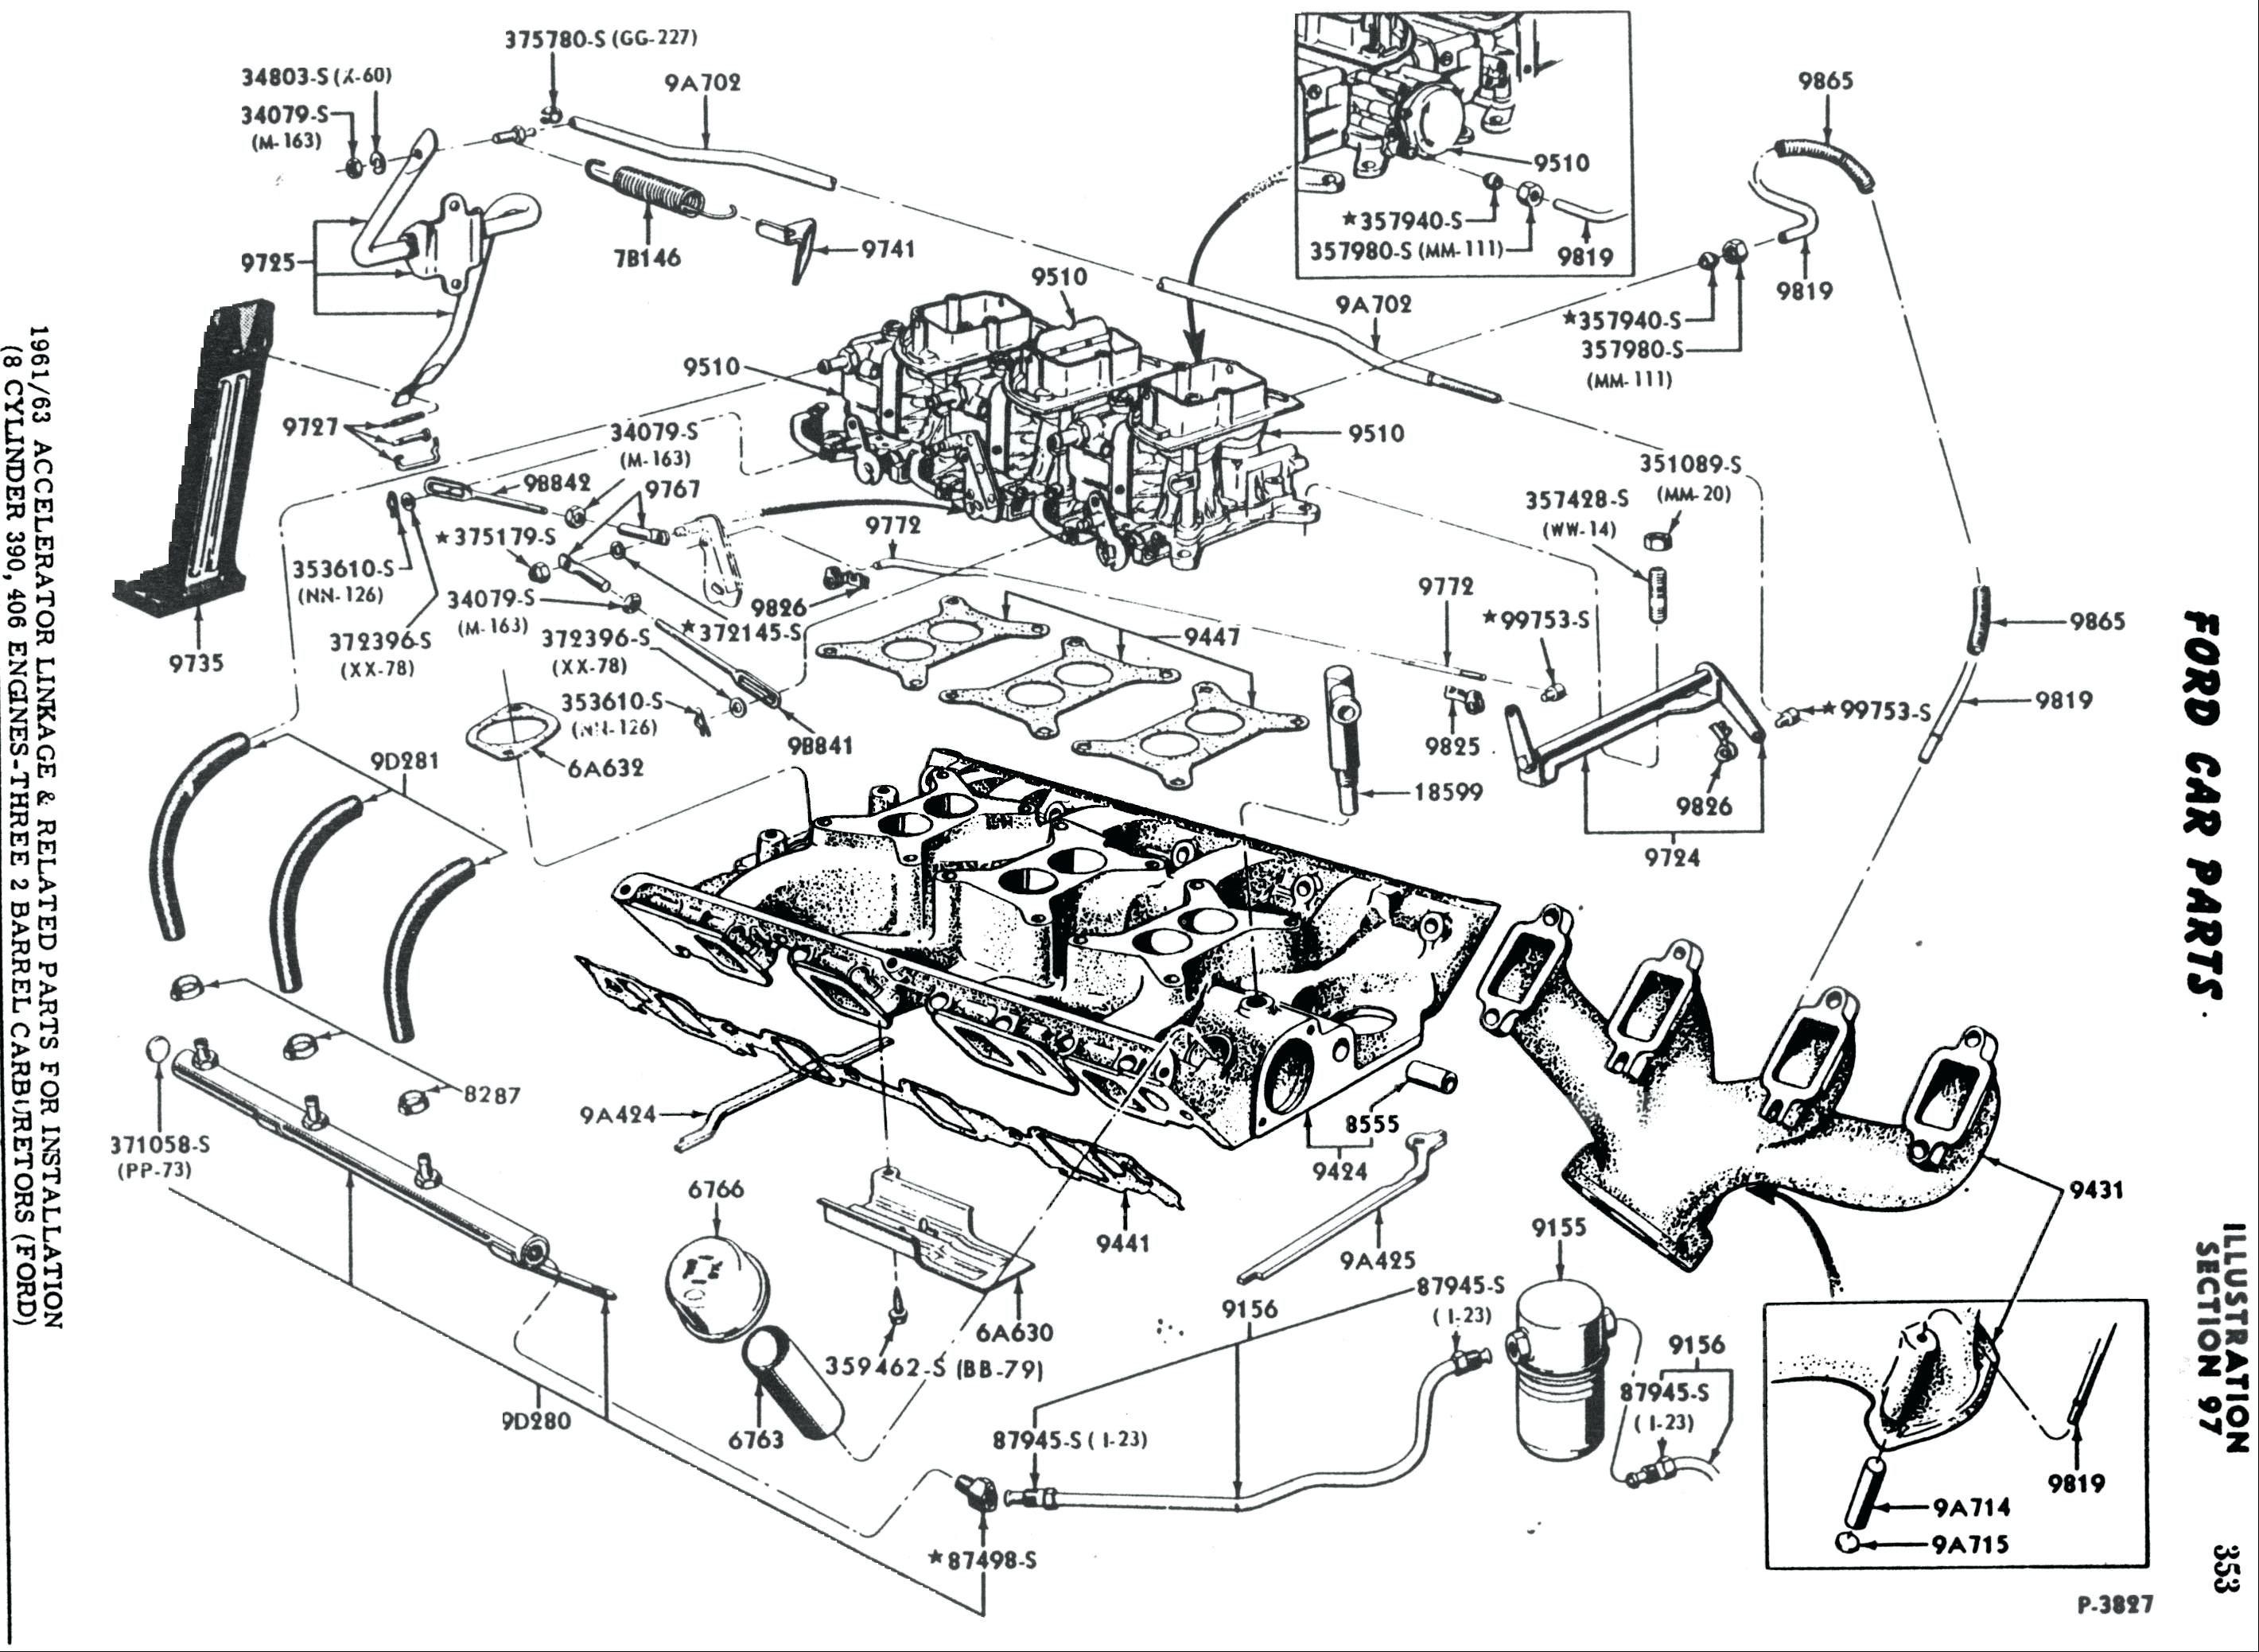 Undercarriage Of A Car Diagram